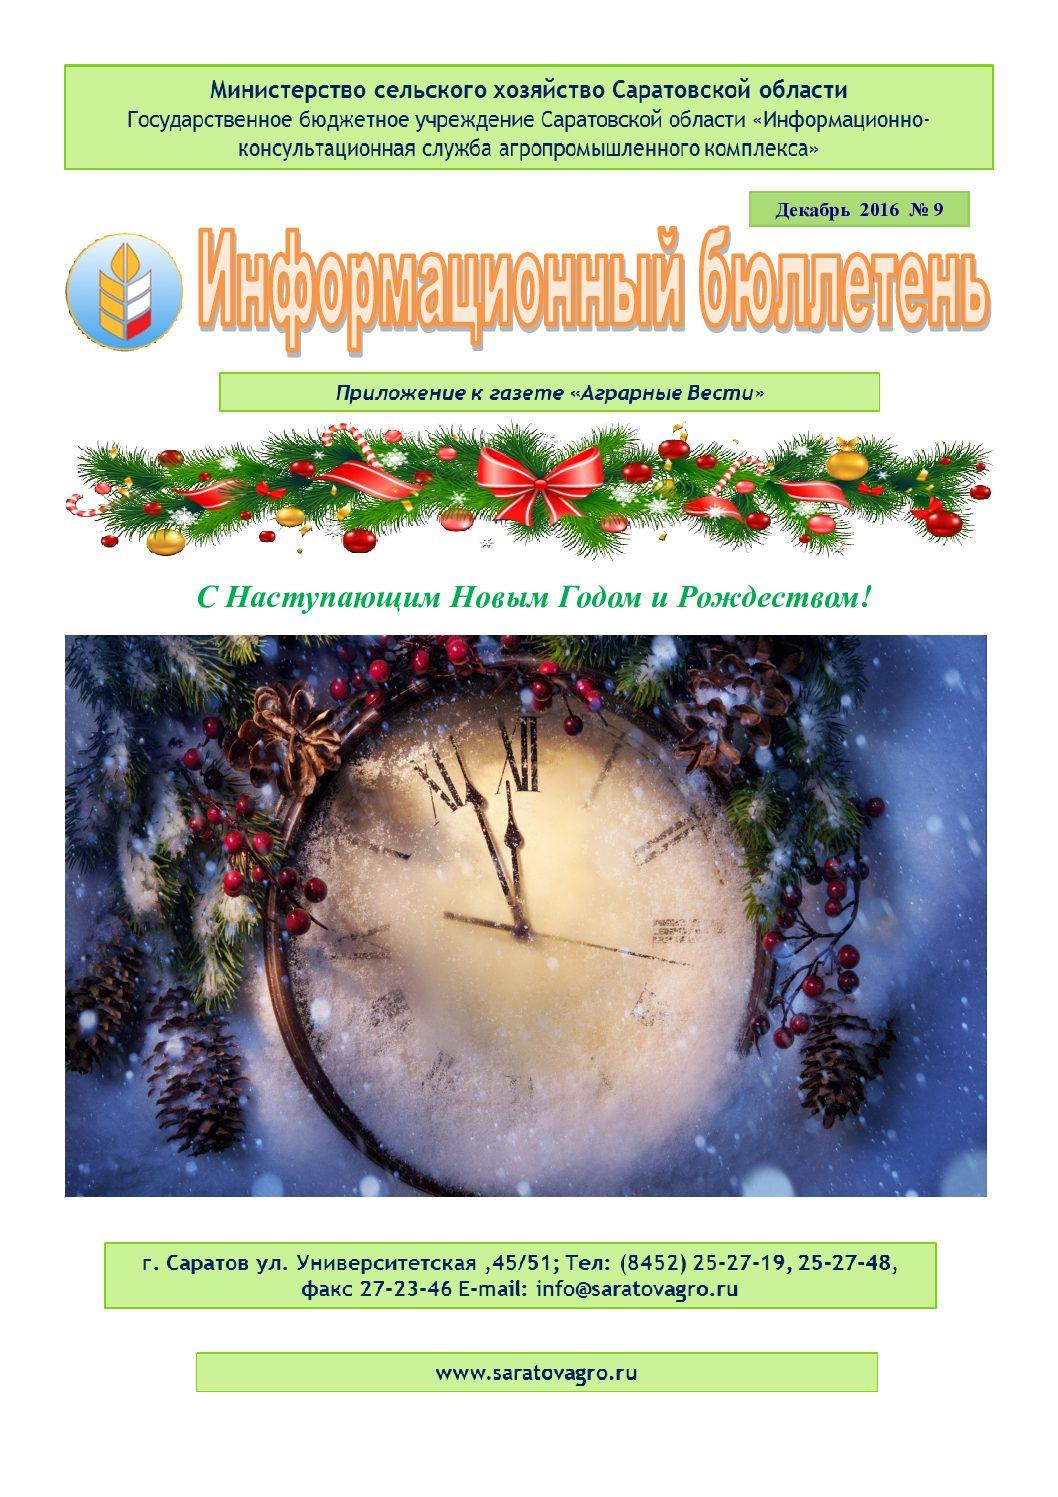 https://saratovagro.ru/wp-content/uploads/2020/08/№9-pdf.jpg